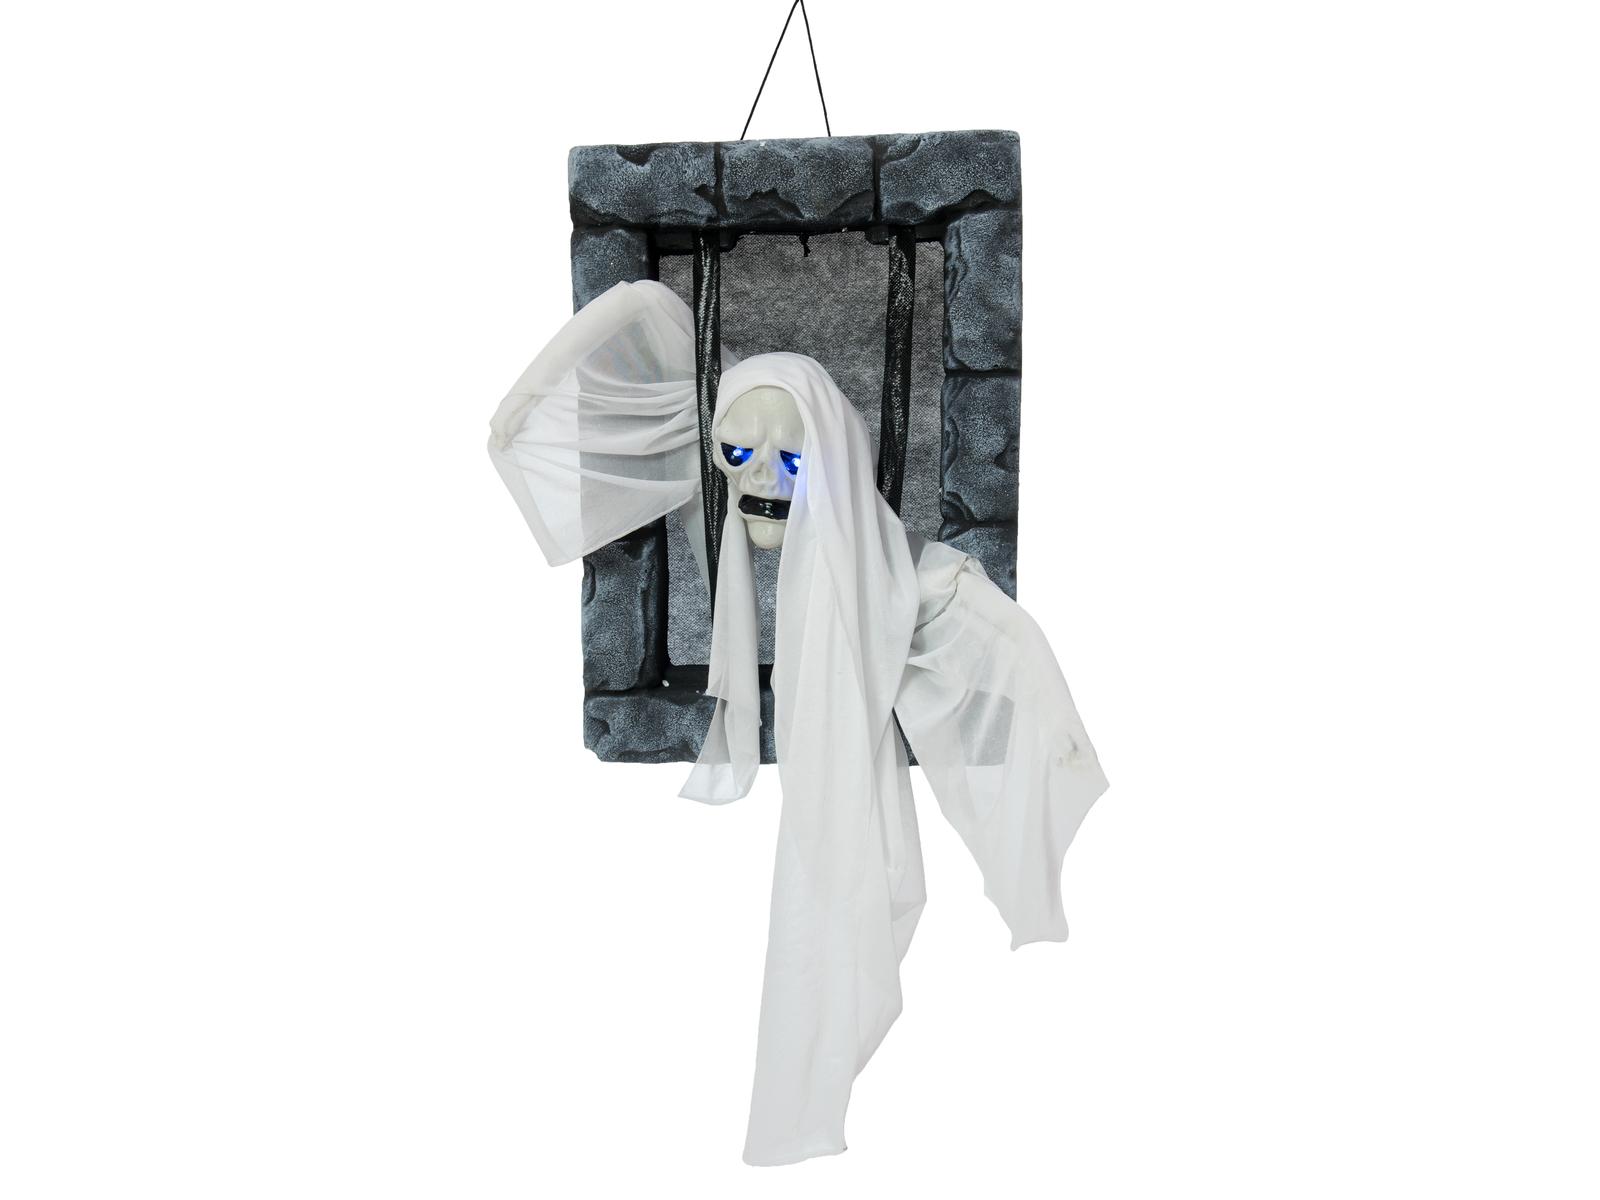 europalms-halloween-figur-geist-im-knast-46cm